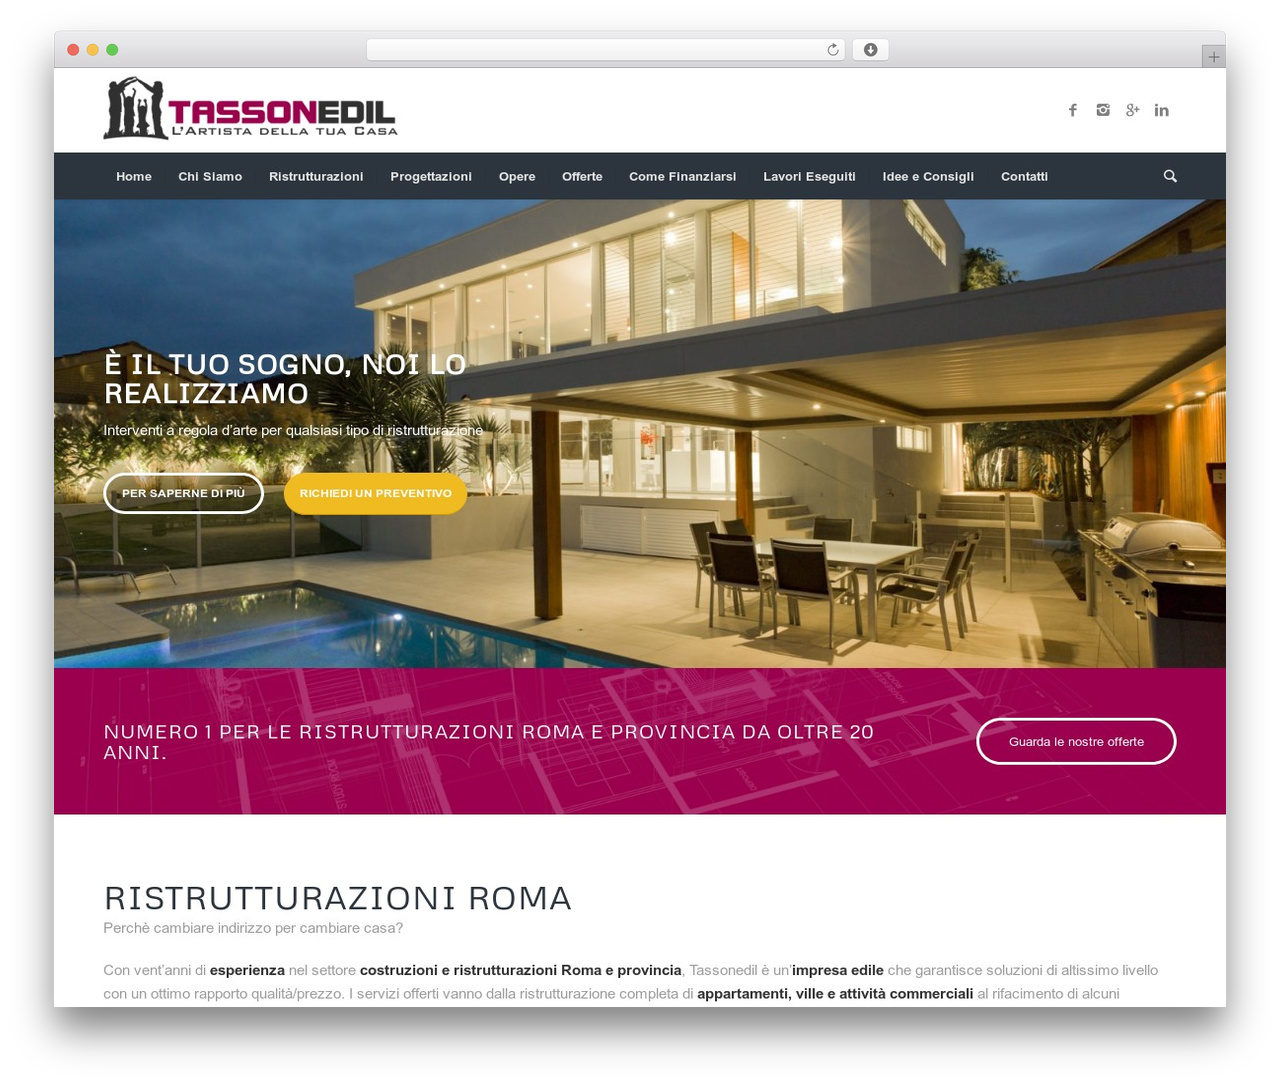 Imprese Di Costruzioni Roma wp template enfold by kriesi - tassonedil.it